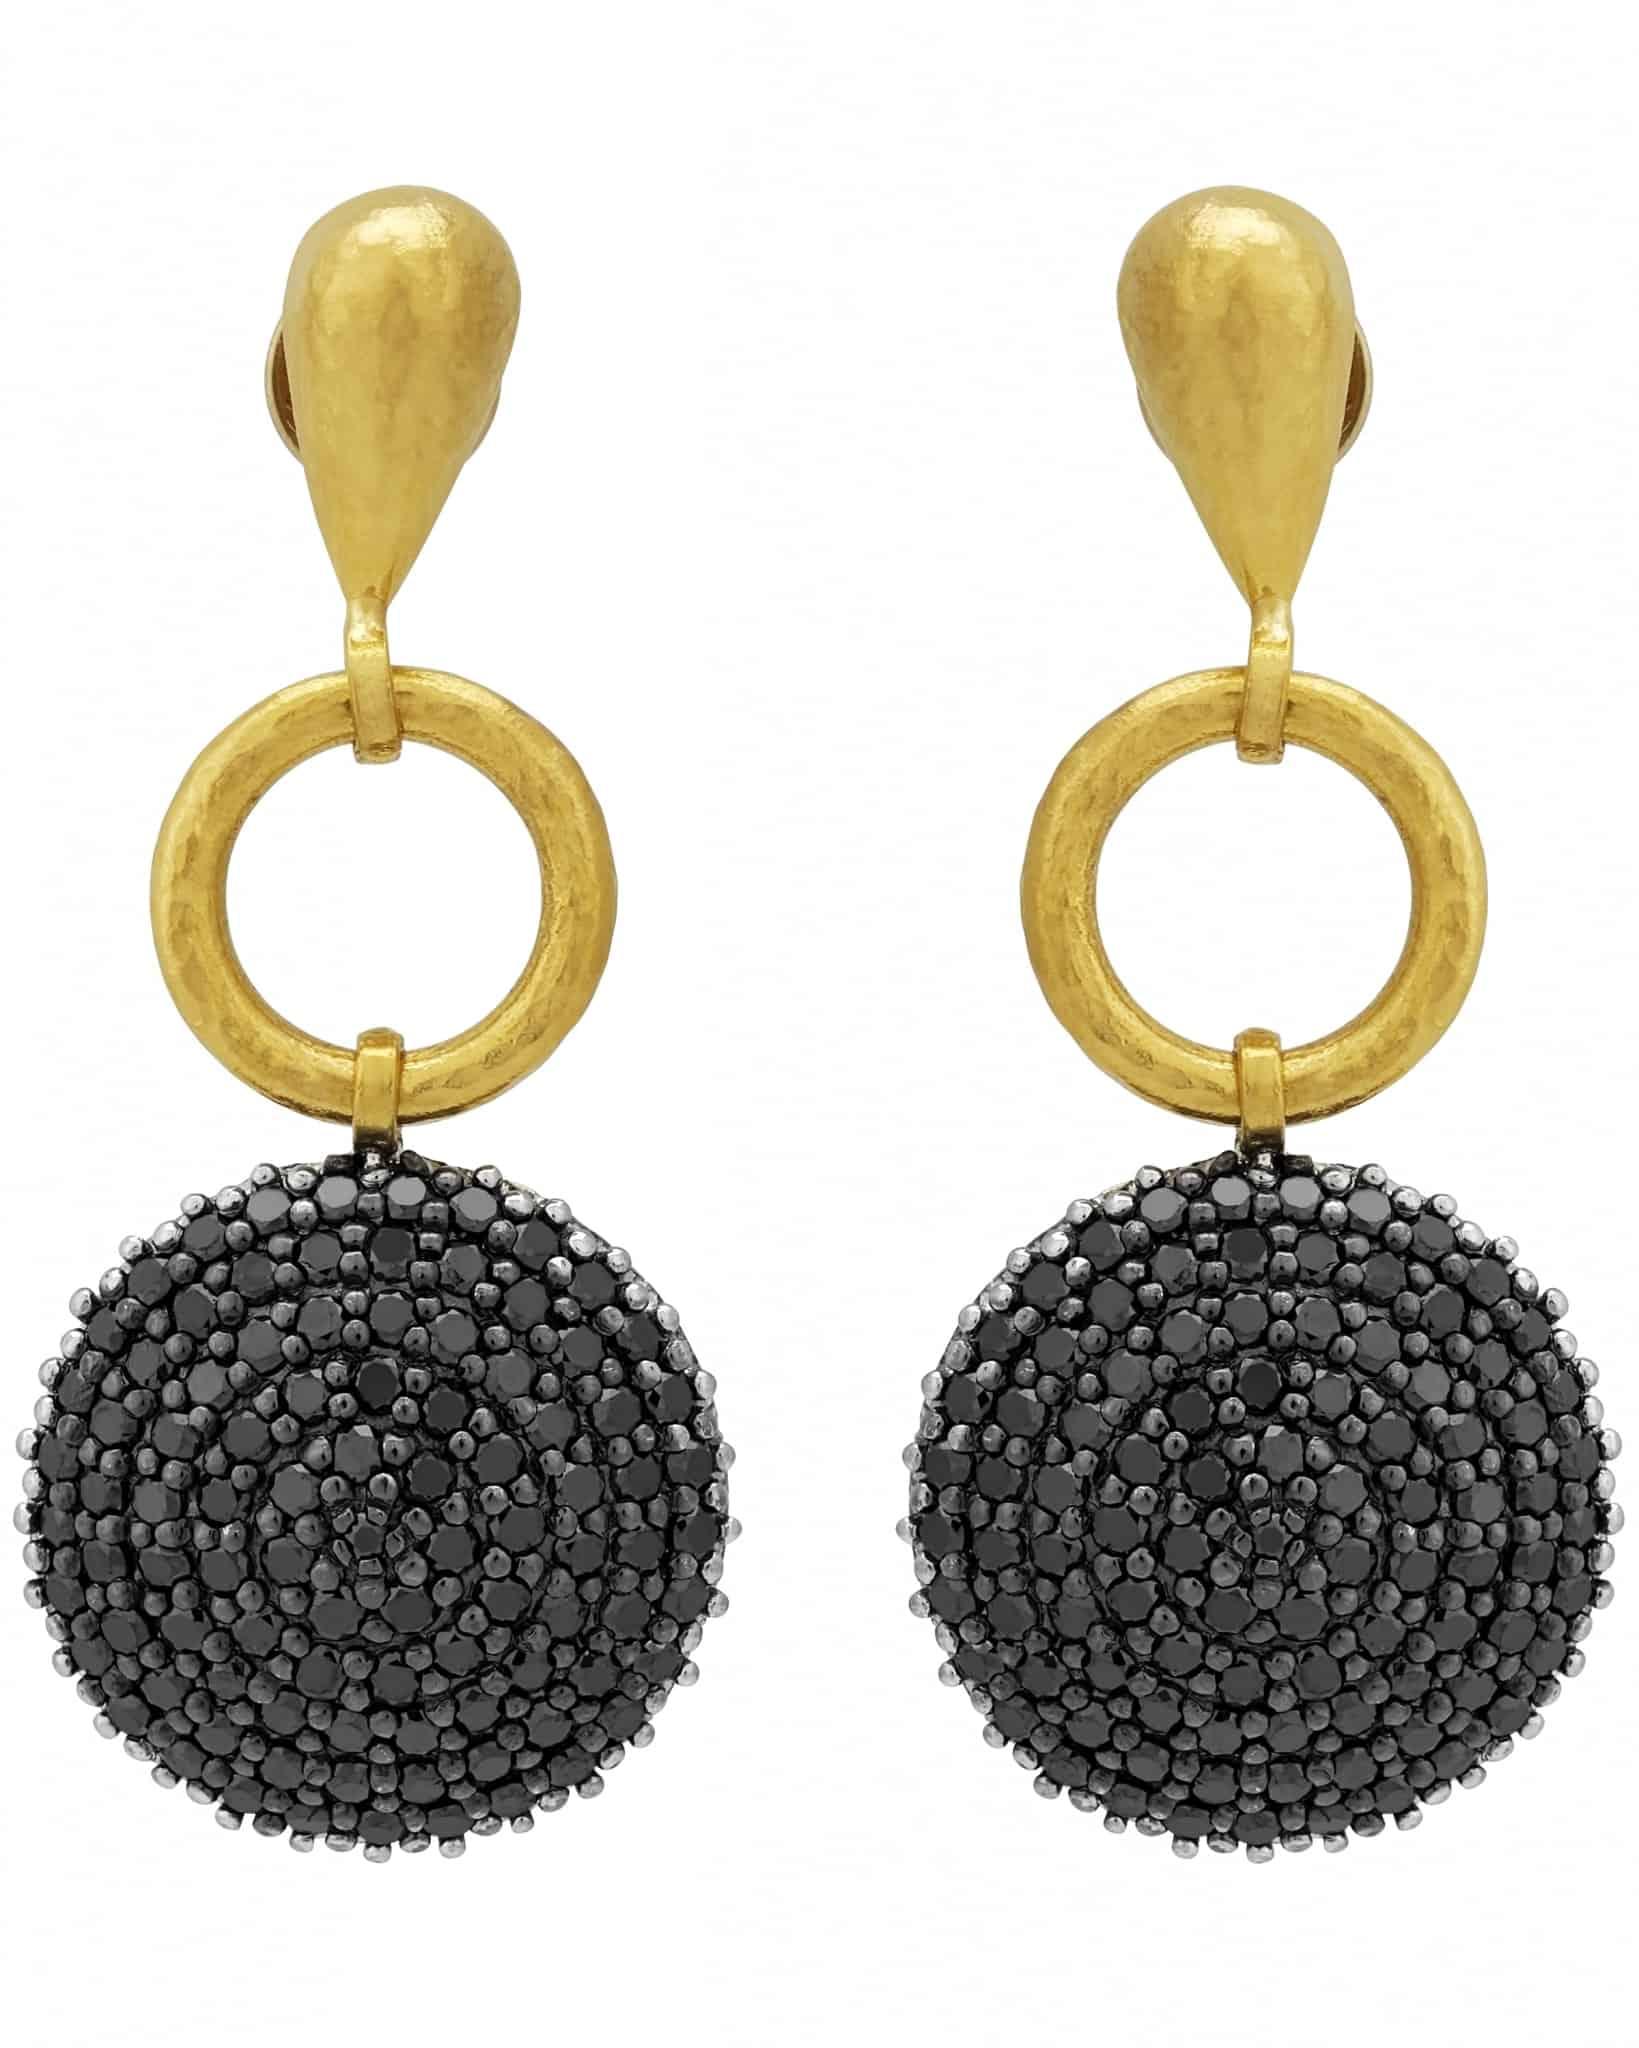 GURHAN – Black Diamond 24k Yellow Gold Drop Earrings TDE-RH8-BDI-LTD18